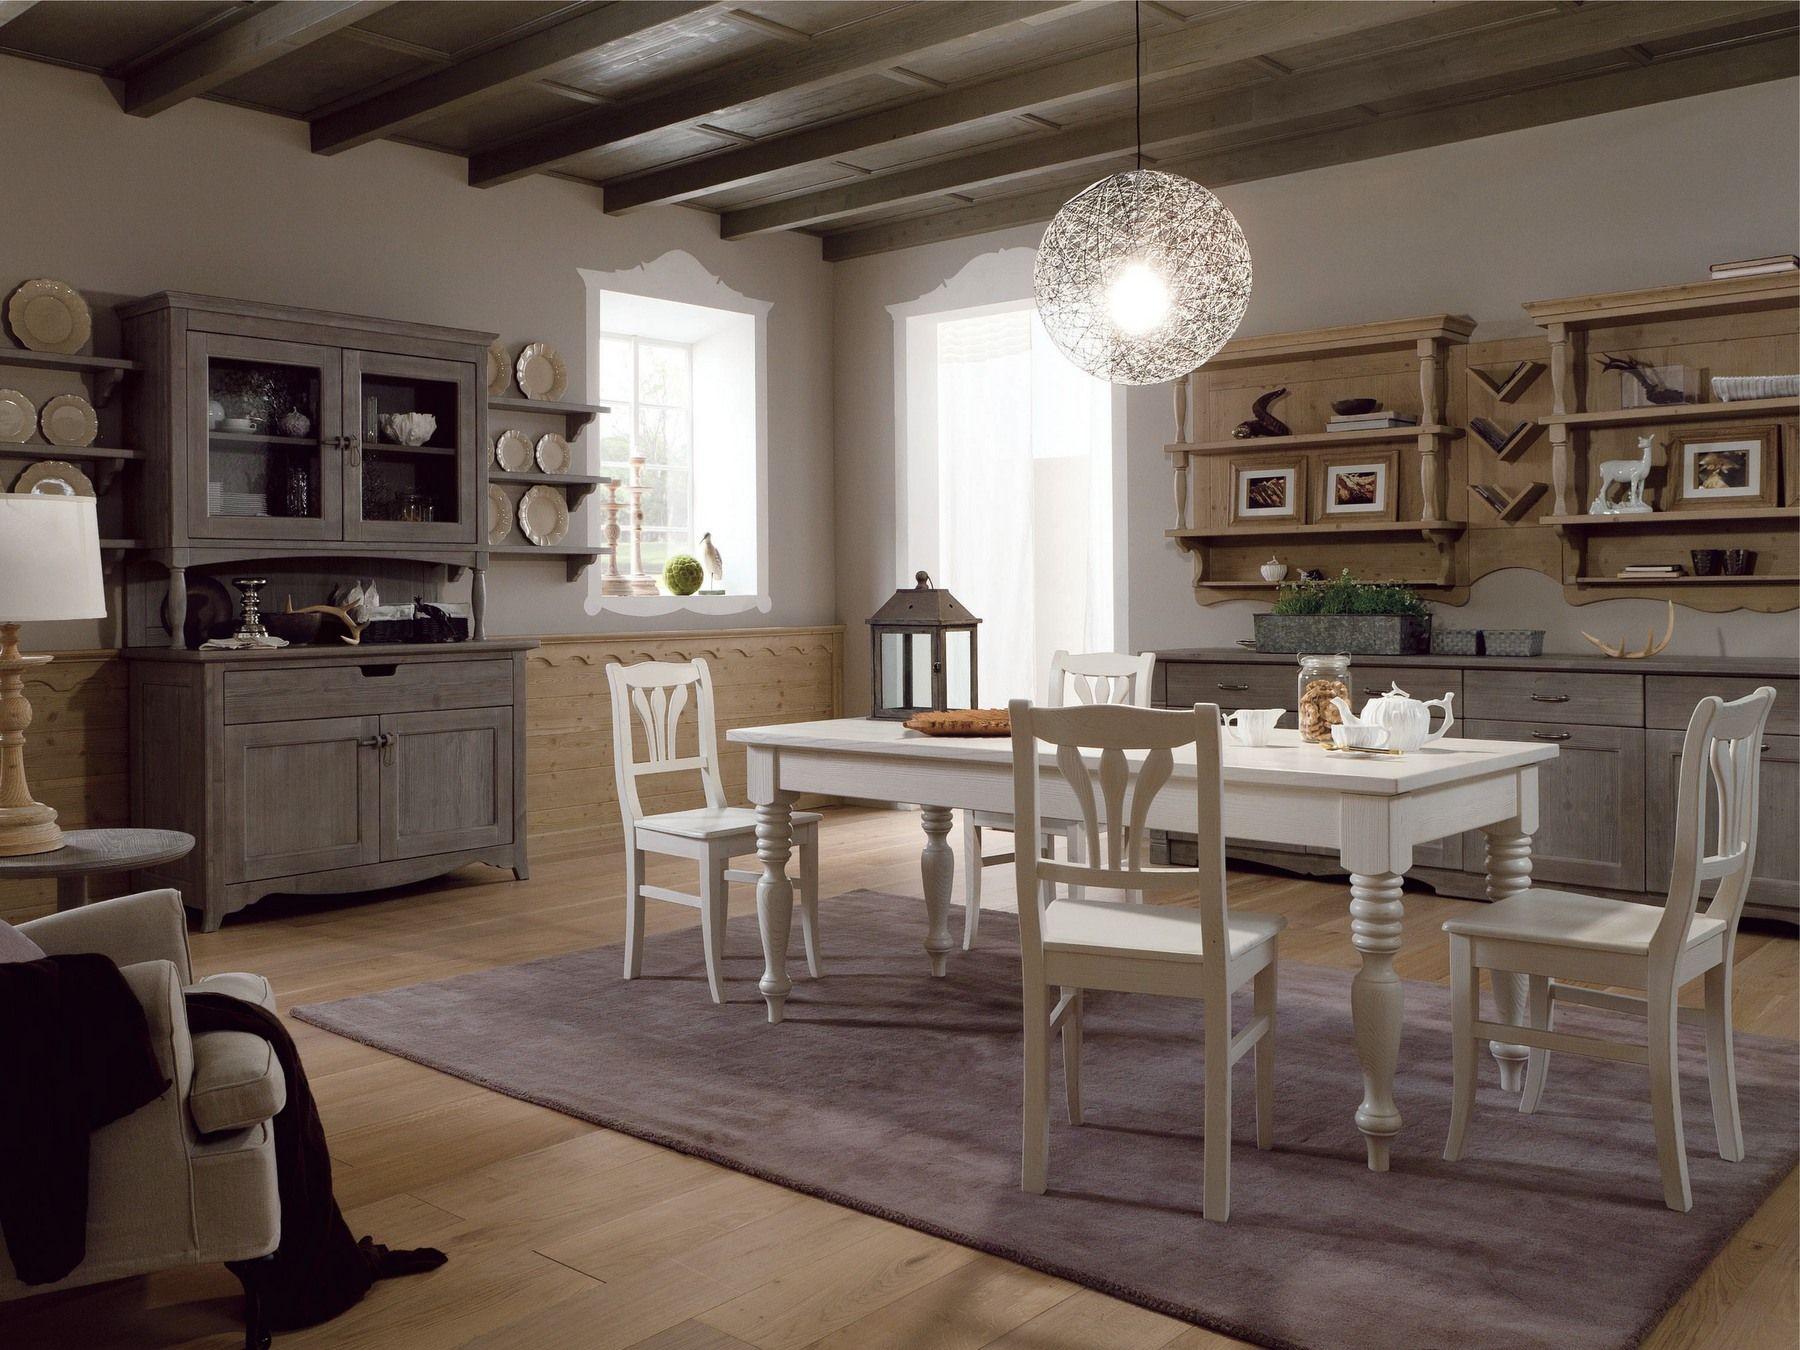 Cucina in stile rustico tabi t04 by scandola mobili - Cucine in stile rustico ...